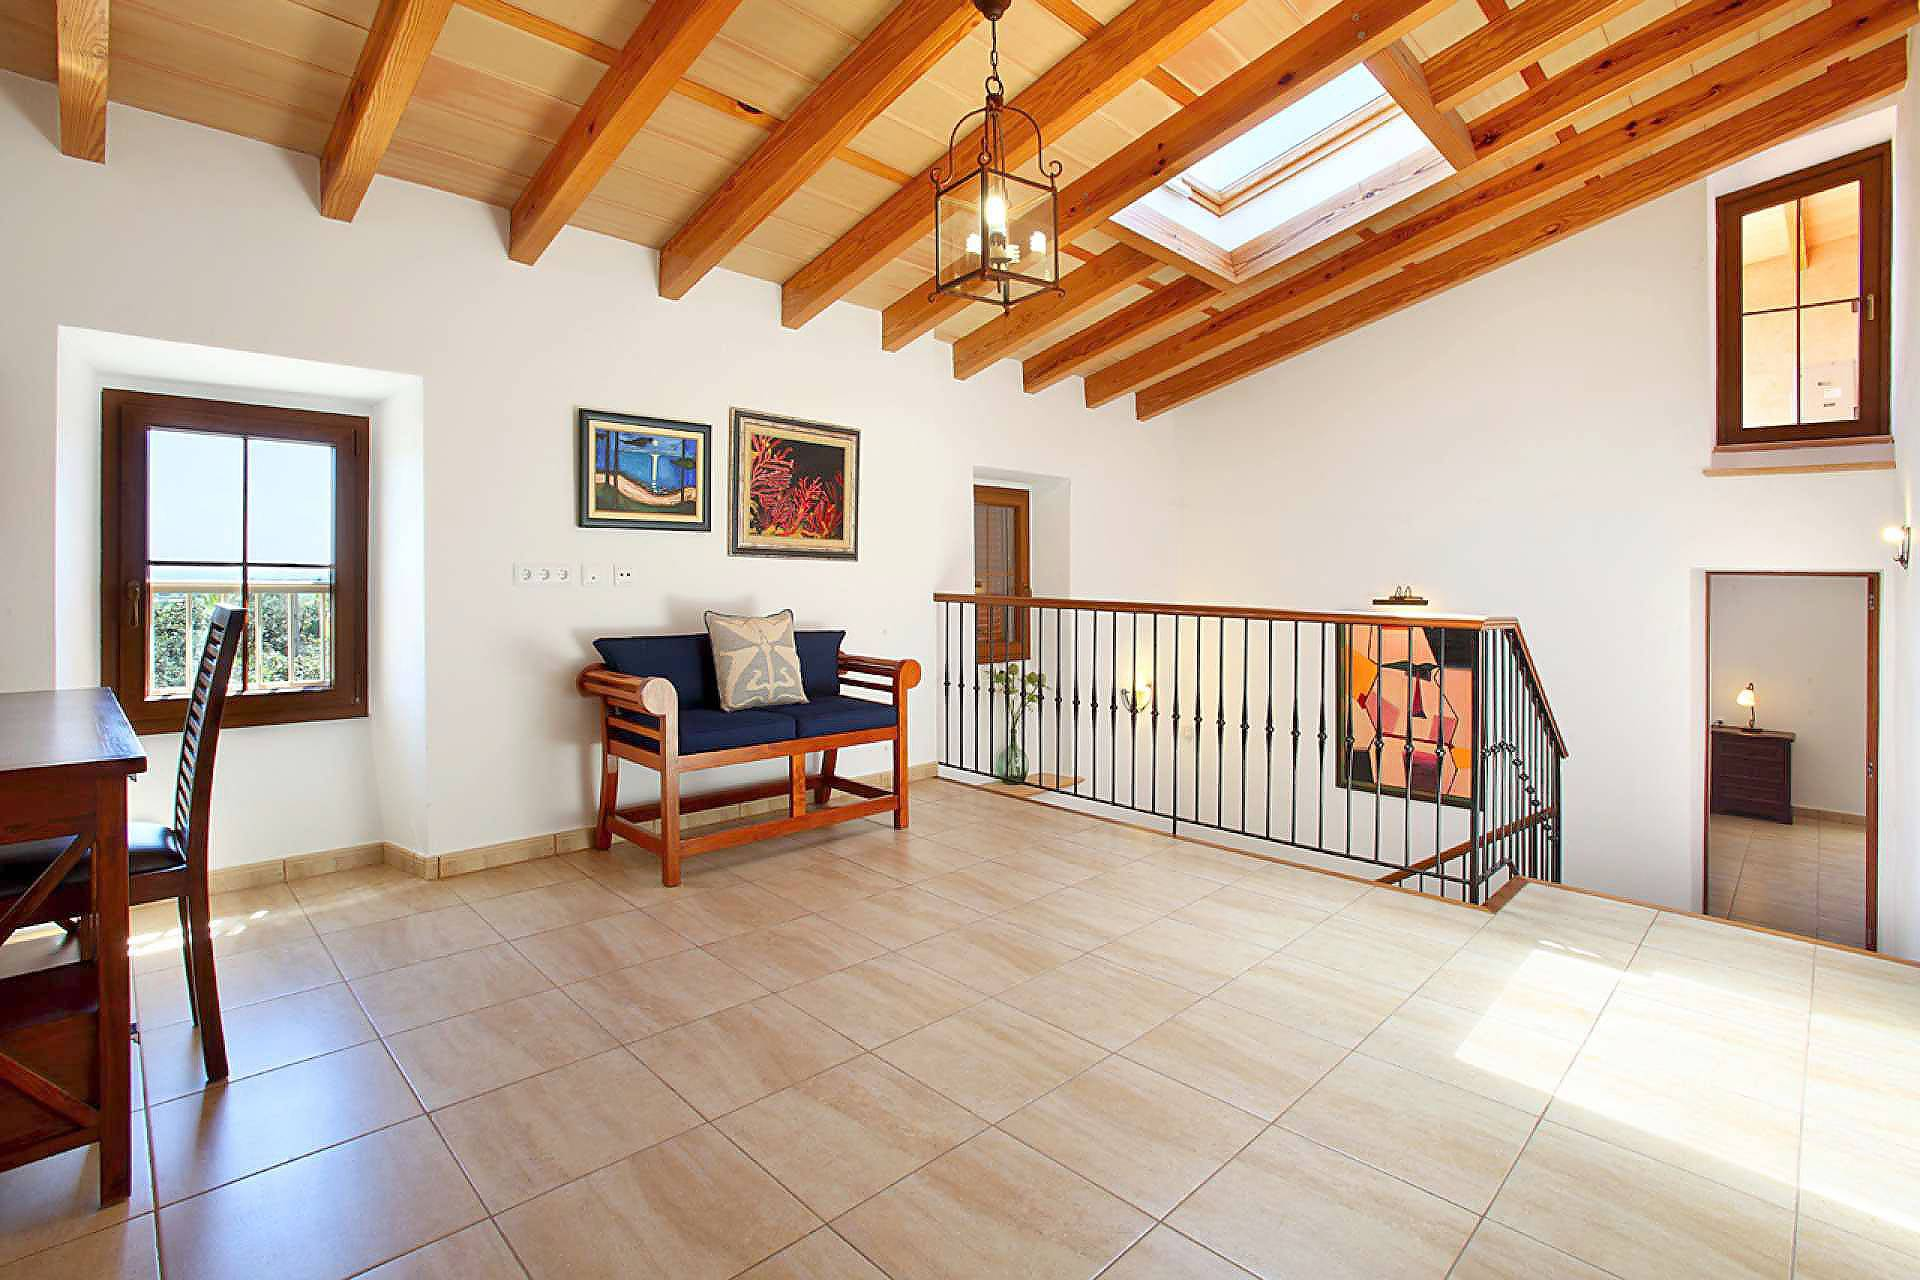 01-33 Großzügiges Ferienhaus Mallorca Osten Bild 26